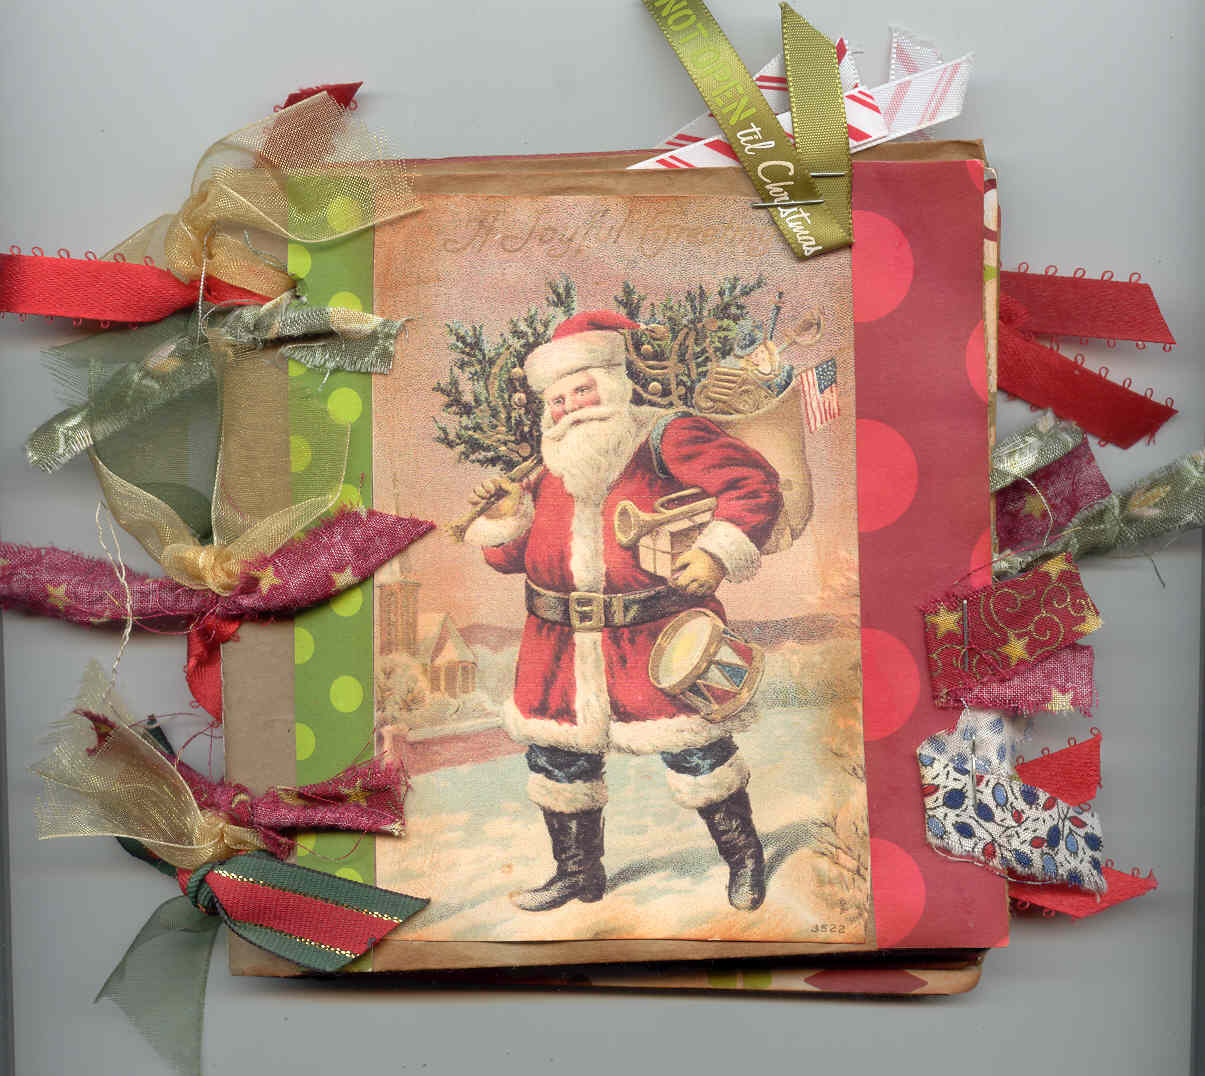 http://3.bp.blogspot.com/_K003iKwJkNg/SwcCNO_J2oI/AAAAAAAADSA/YvjZw8B_kpw/s1600/paper+bag+book.jpg